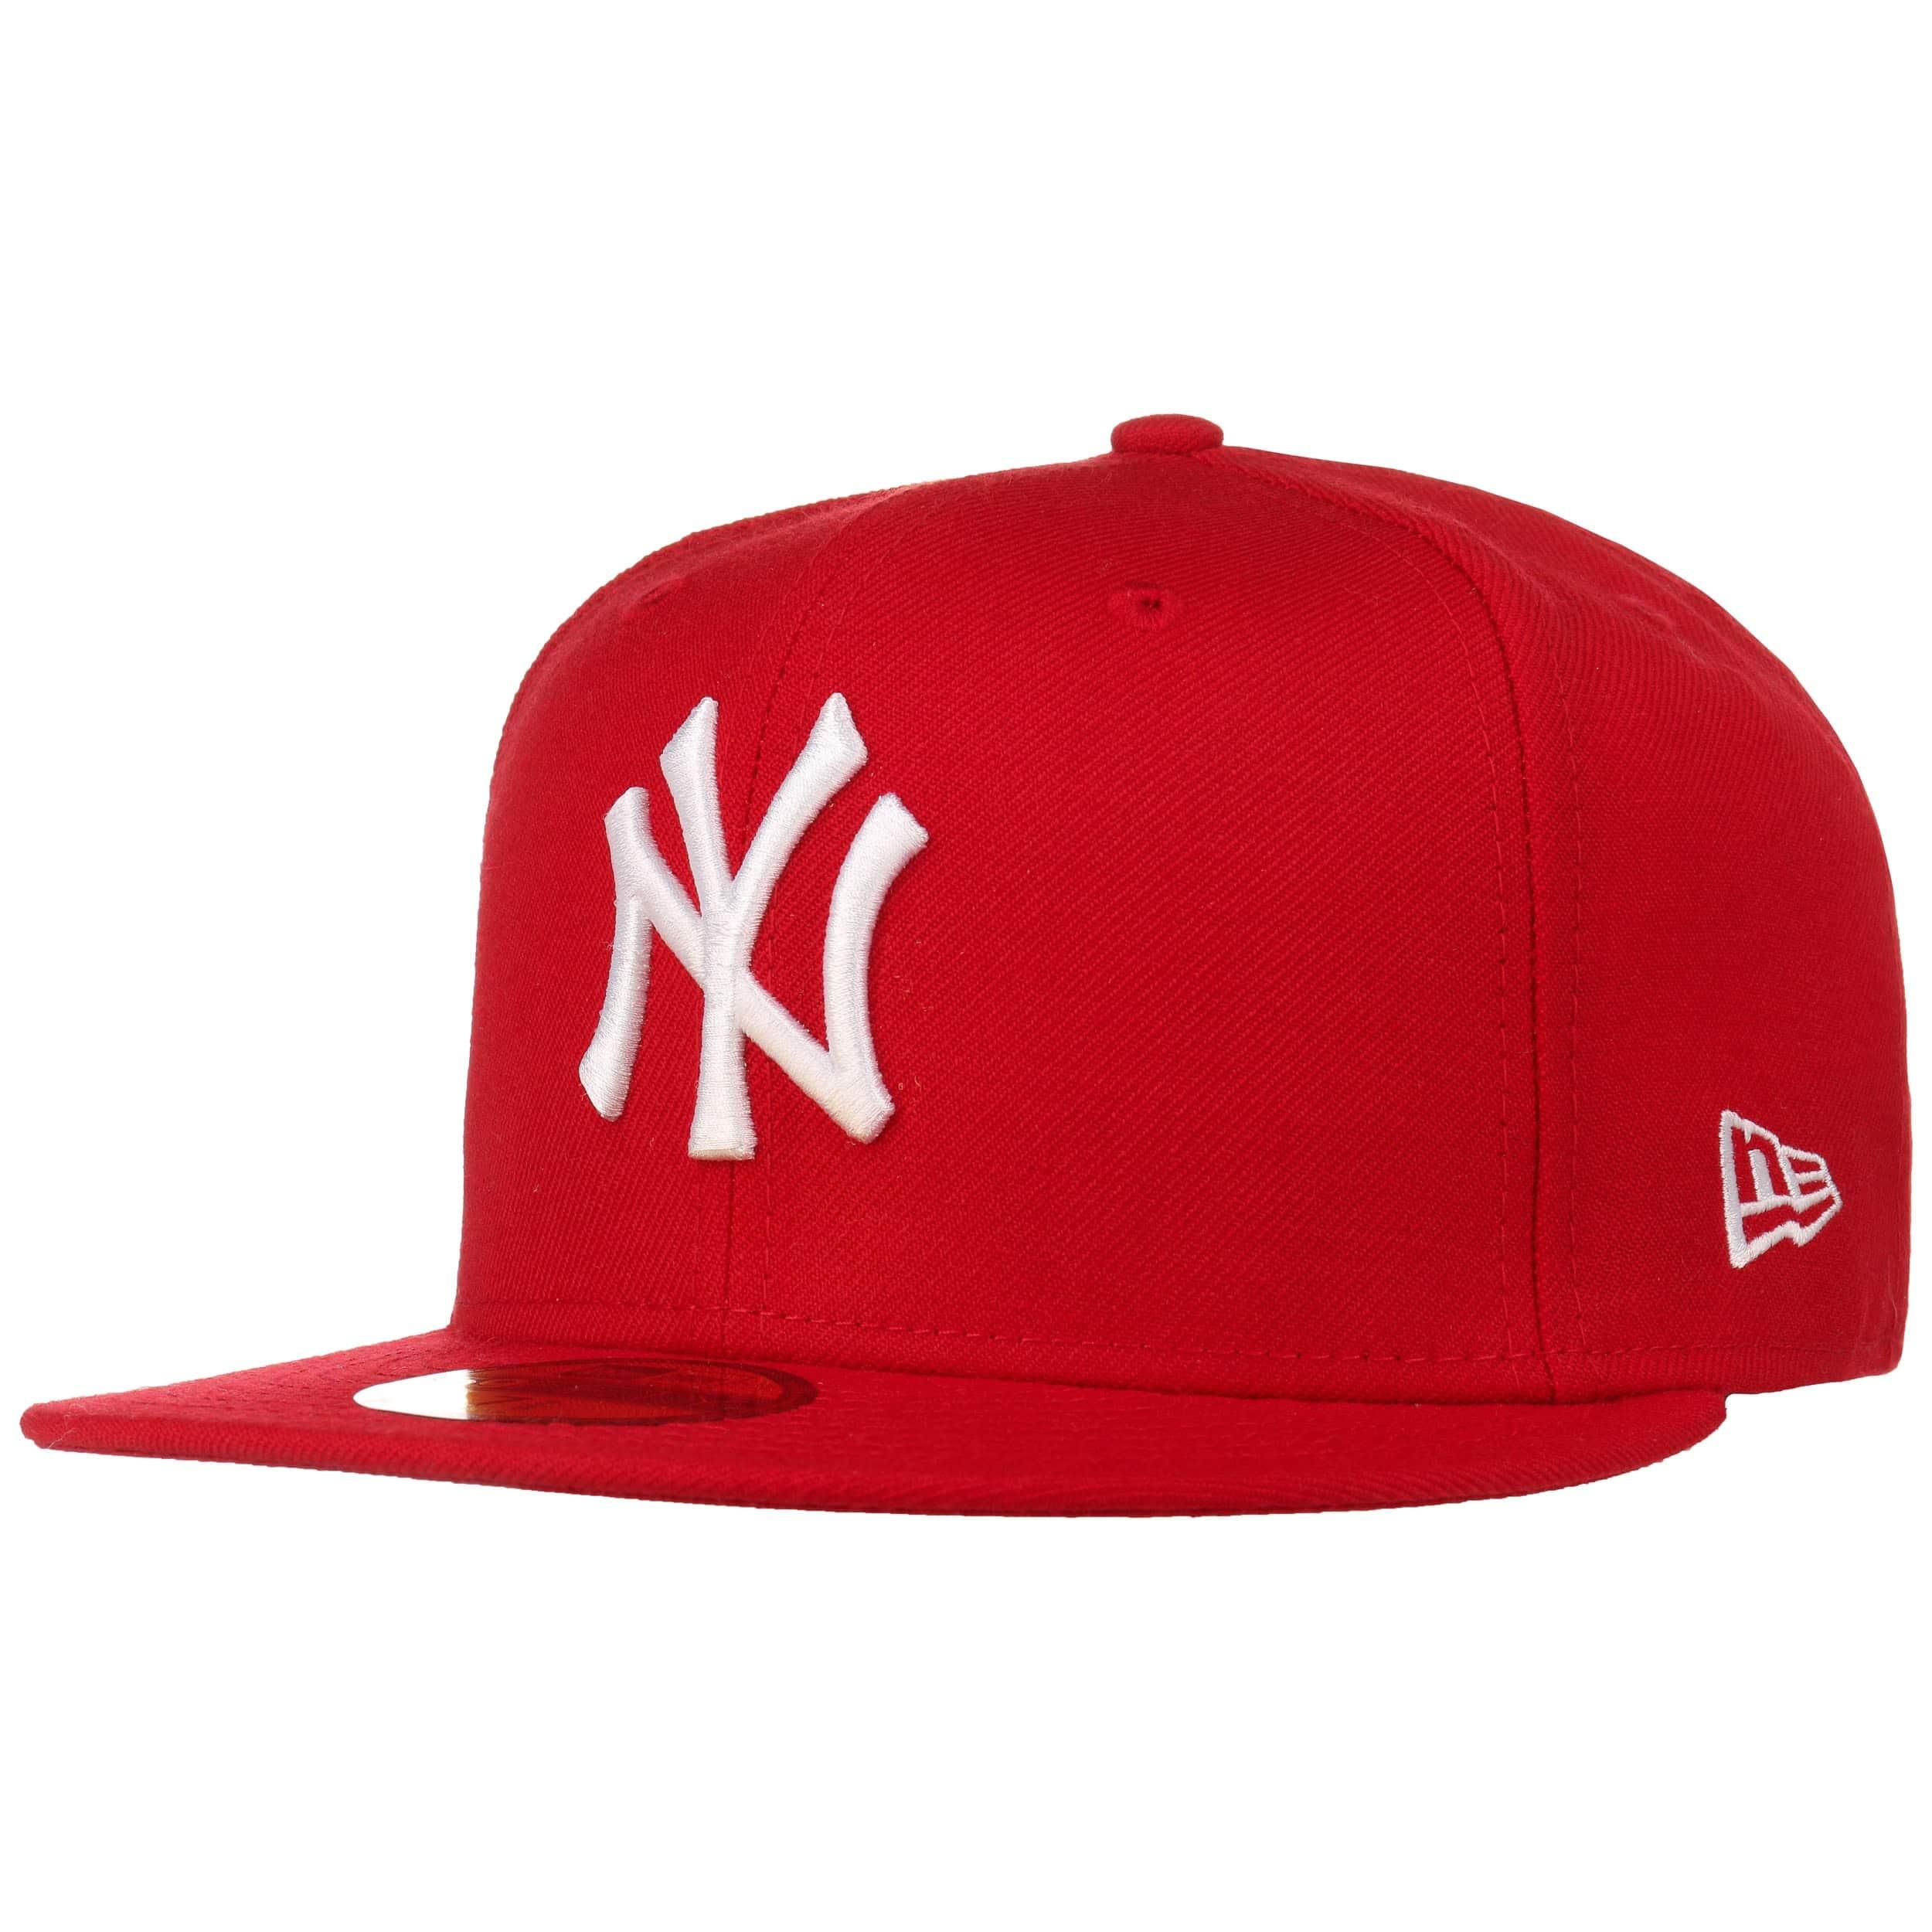 59Fifty Gorra MLB Basic NY by New Era - Gorras - sombreroshop.es 1cc0f9c78a8